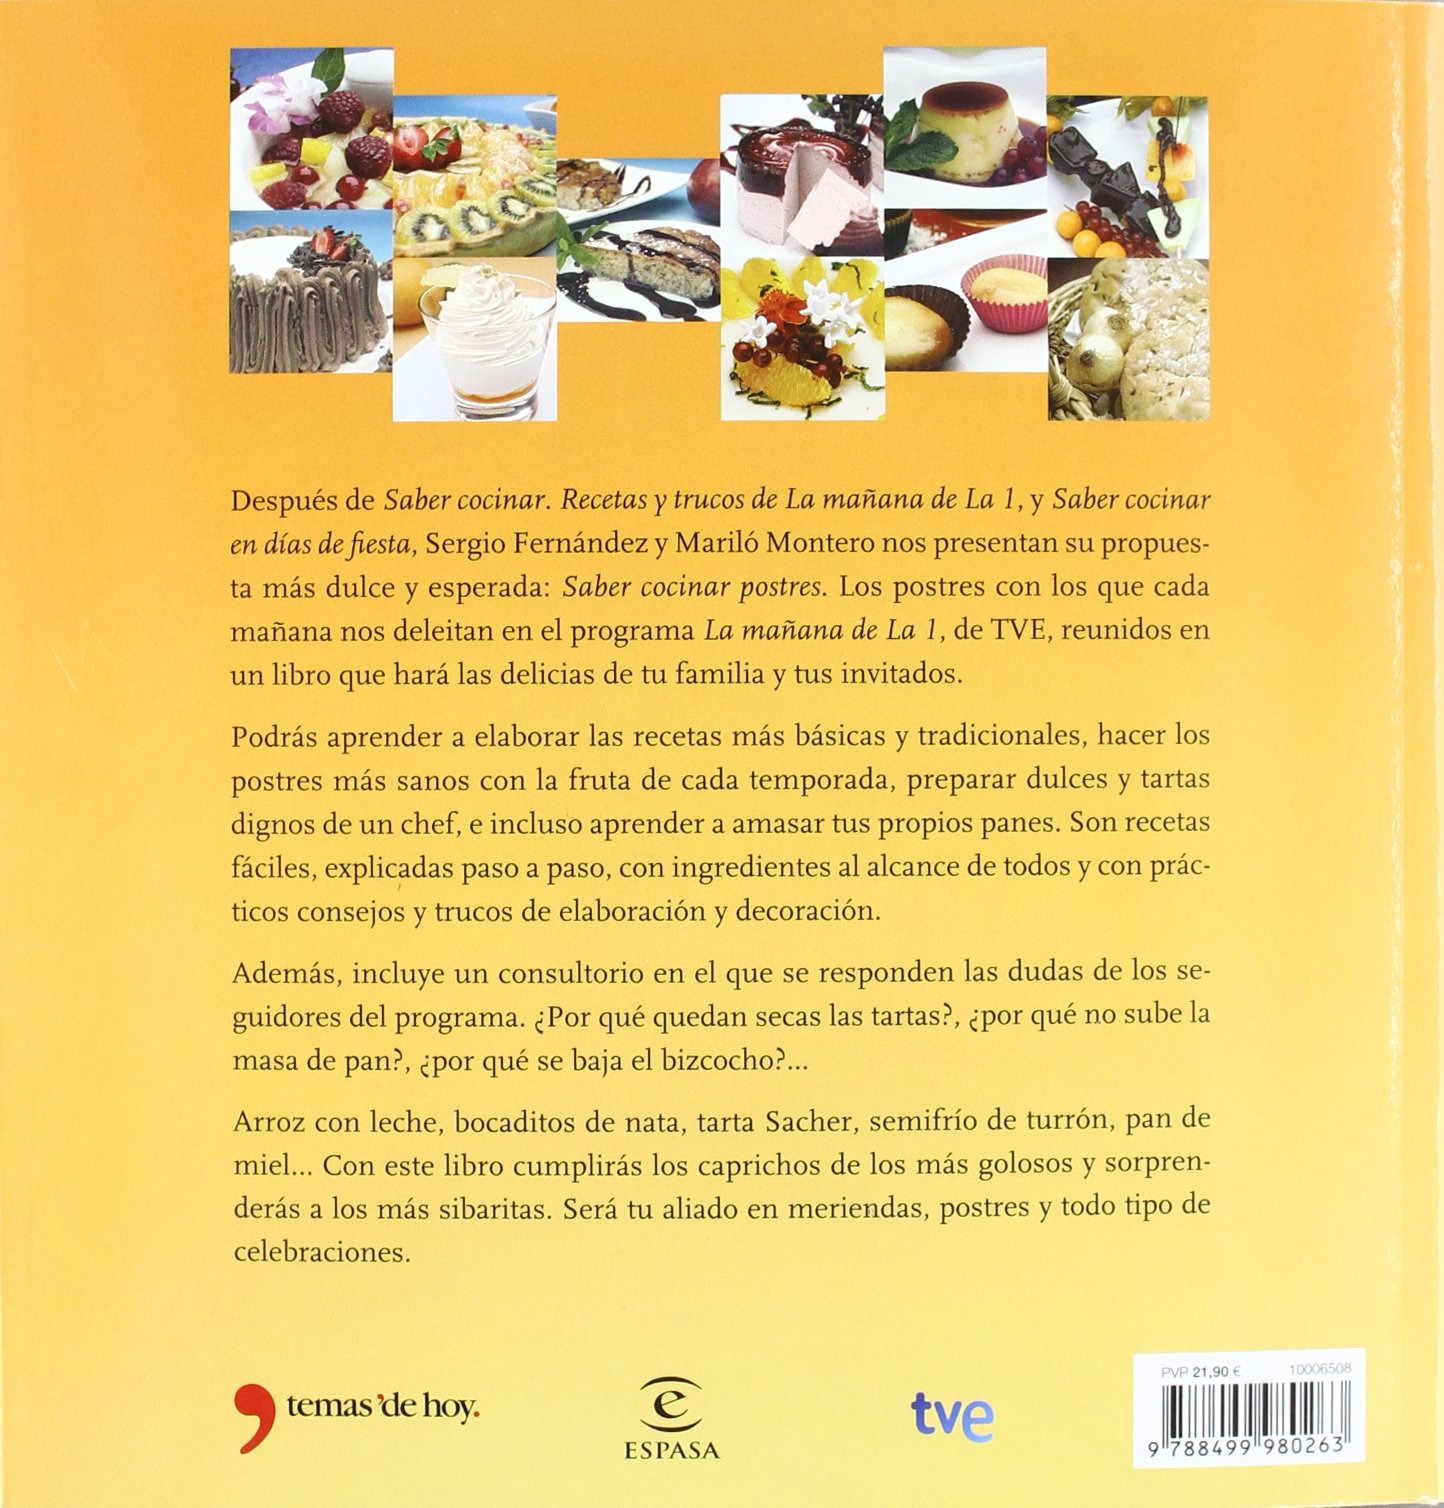 Saber cocinar postres: Mariló; Fernández, Sergio Montero: 9788499980263: Amazon.com: Books